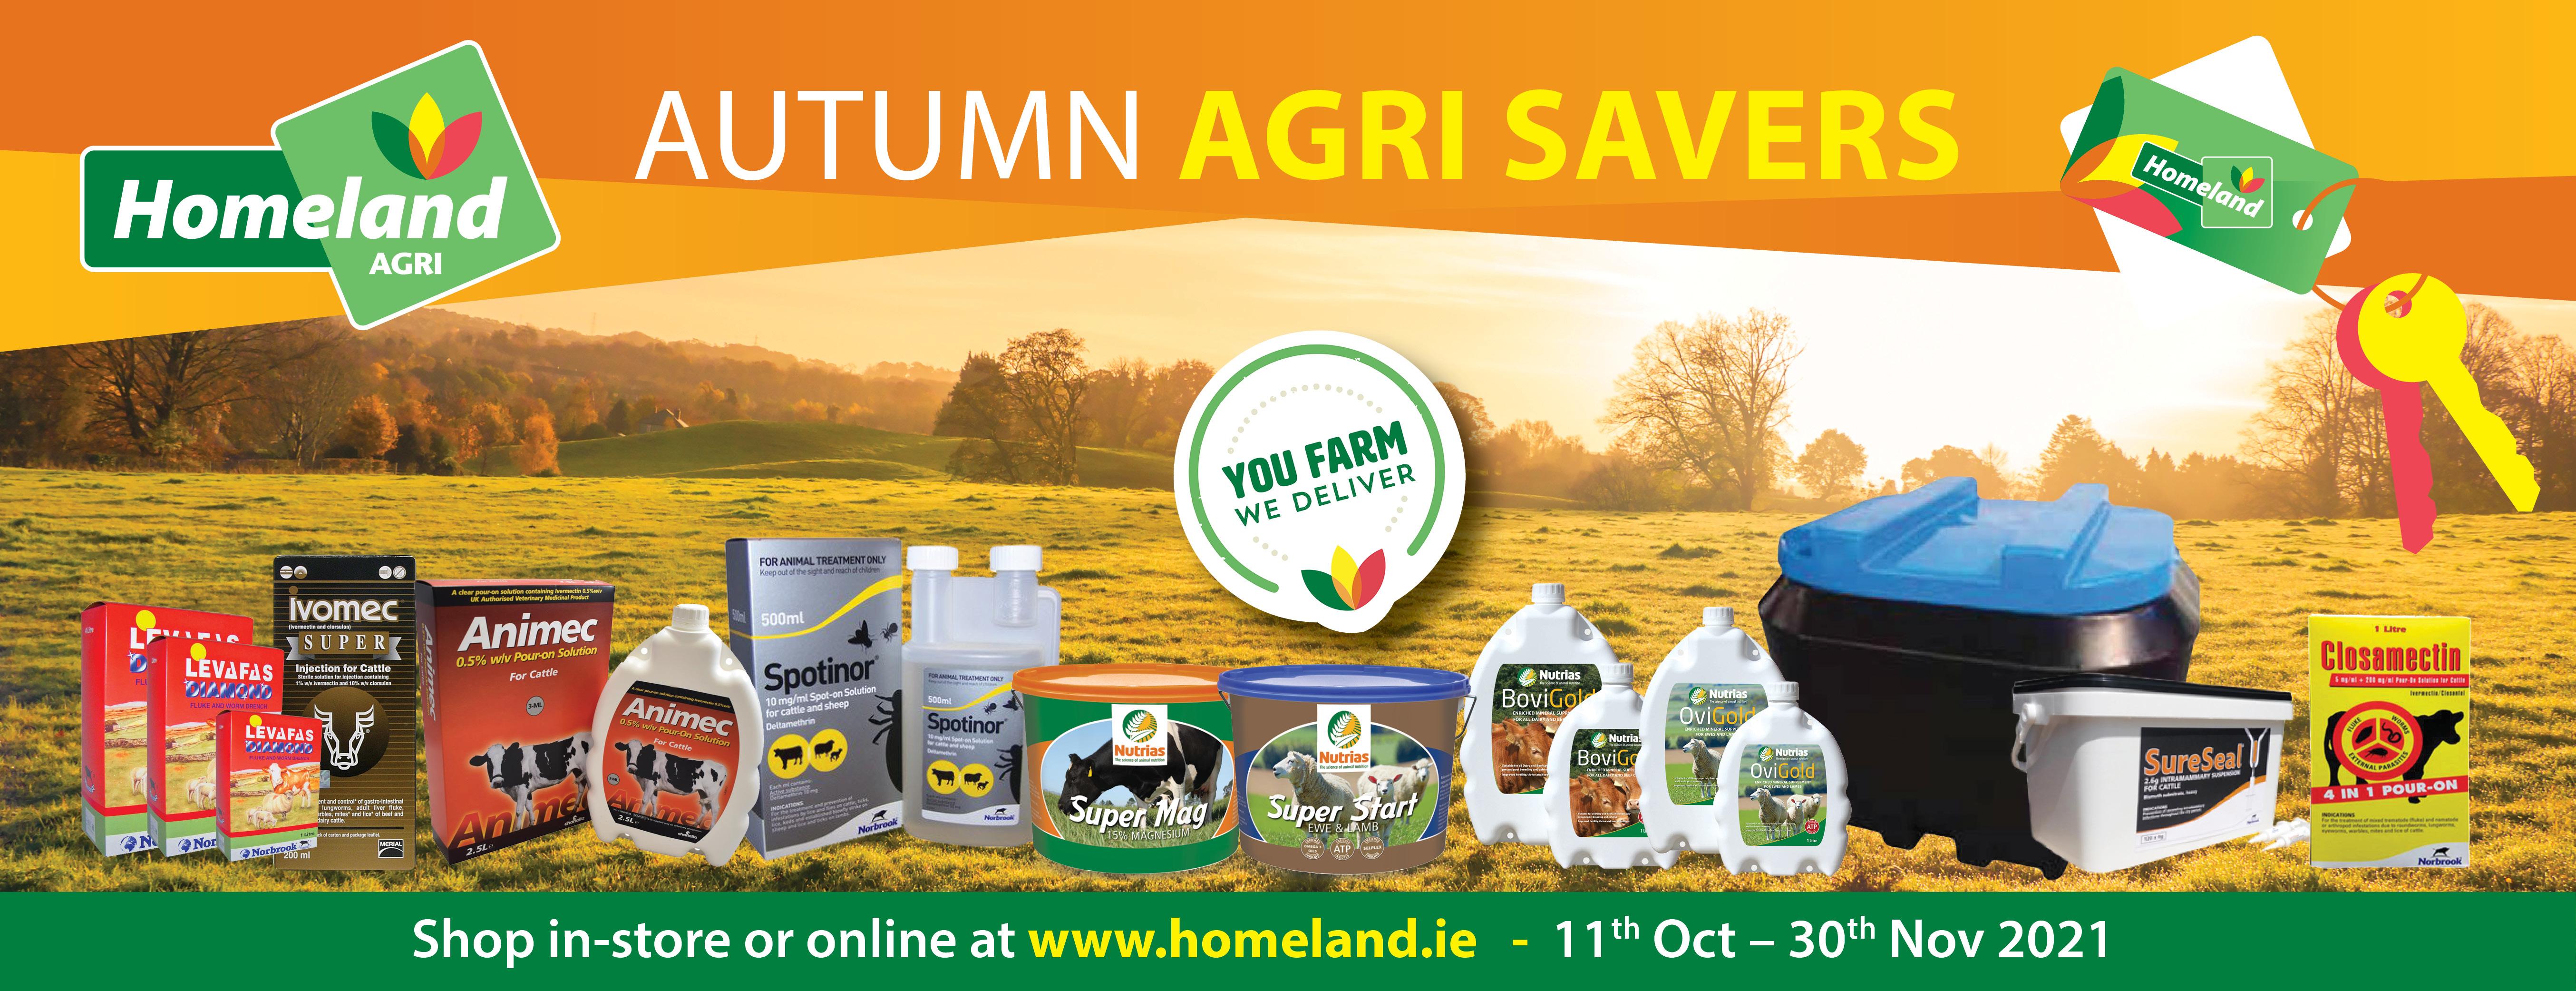 Autumn-Agri-Savers_Banner